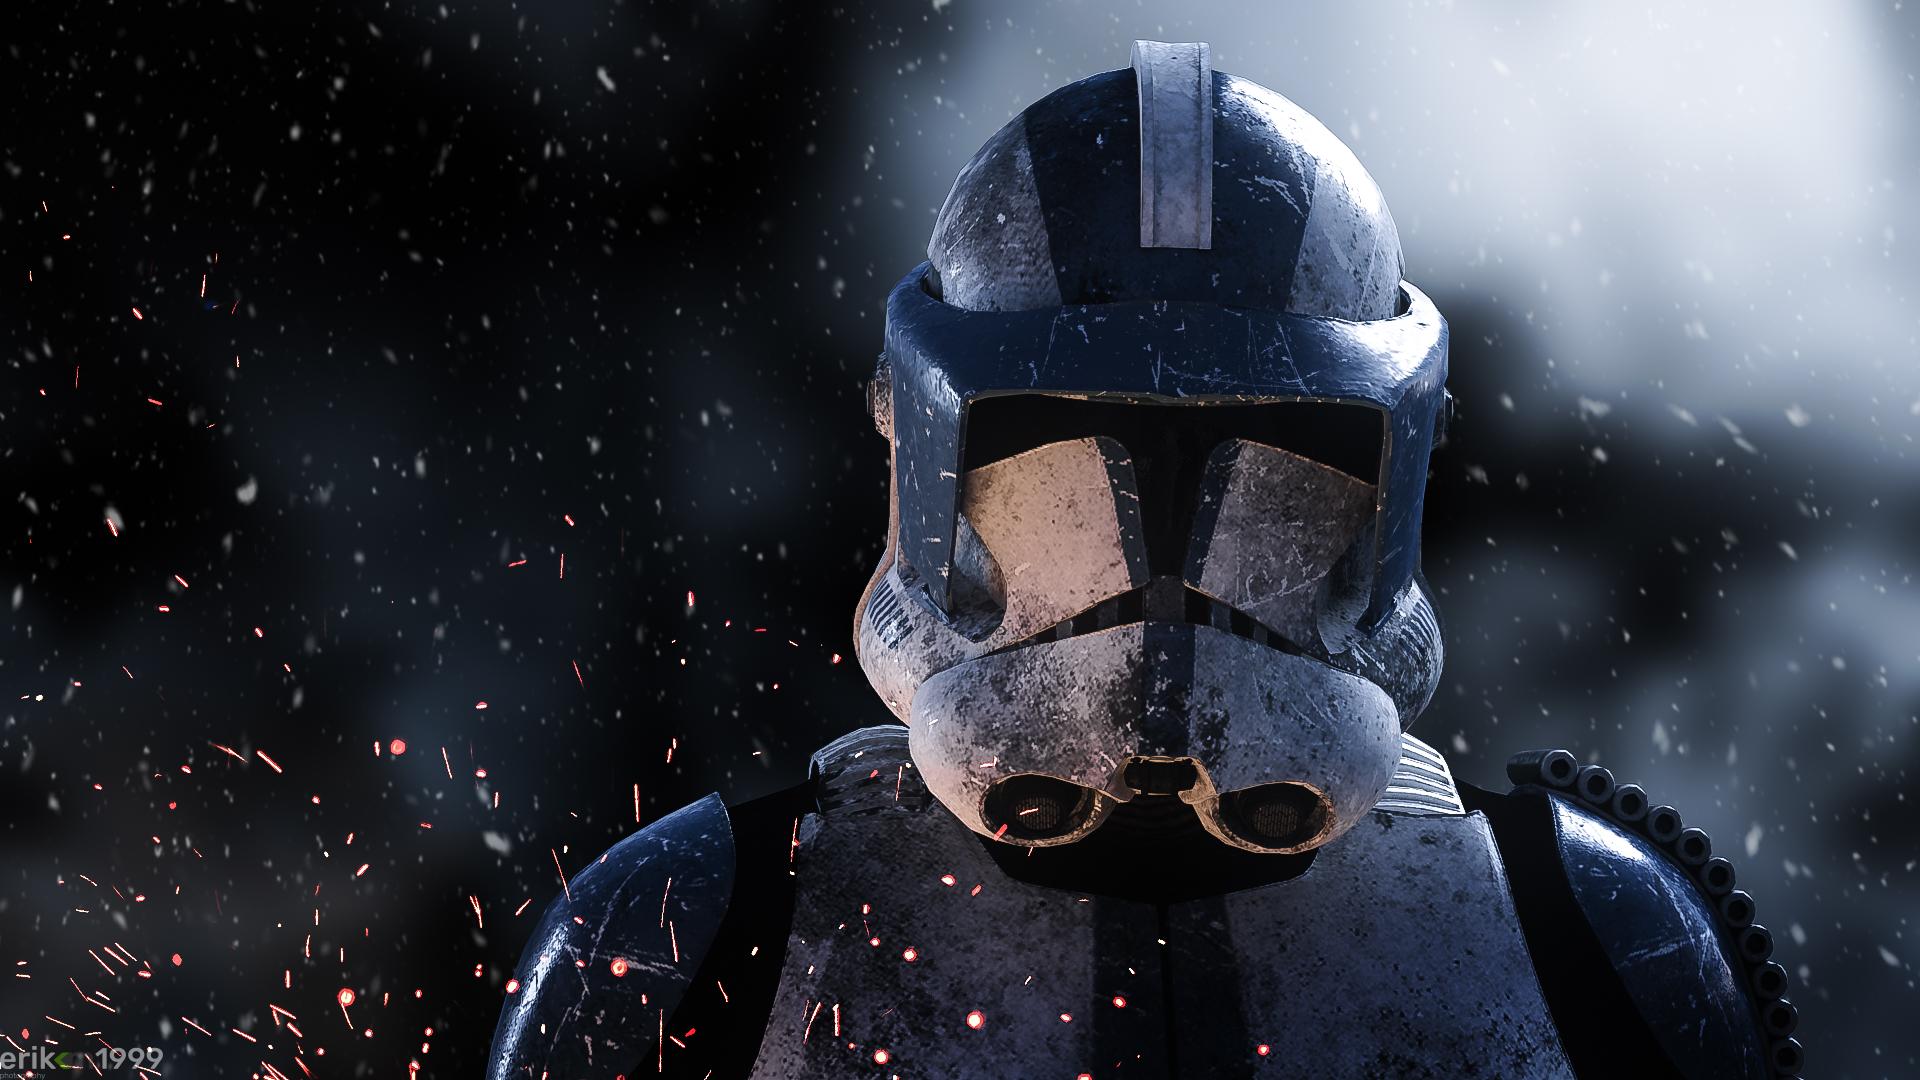 Clone Trooper Star Wars 2018, HD Movies, 4k Wallpapers